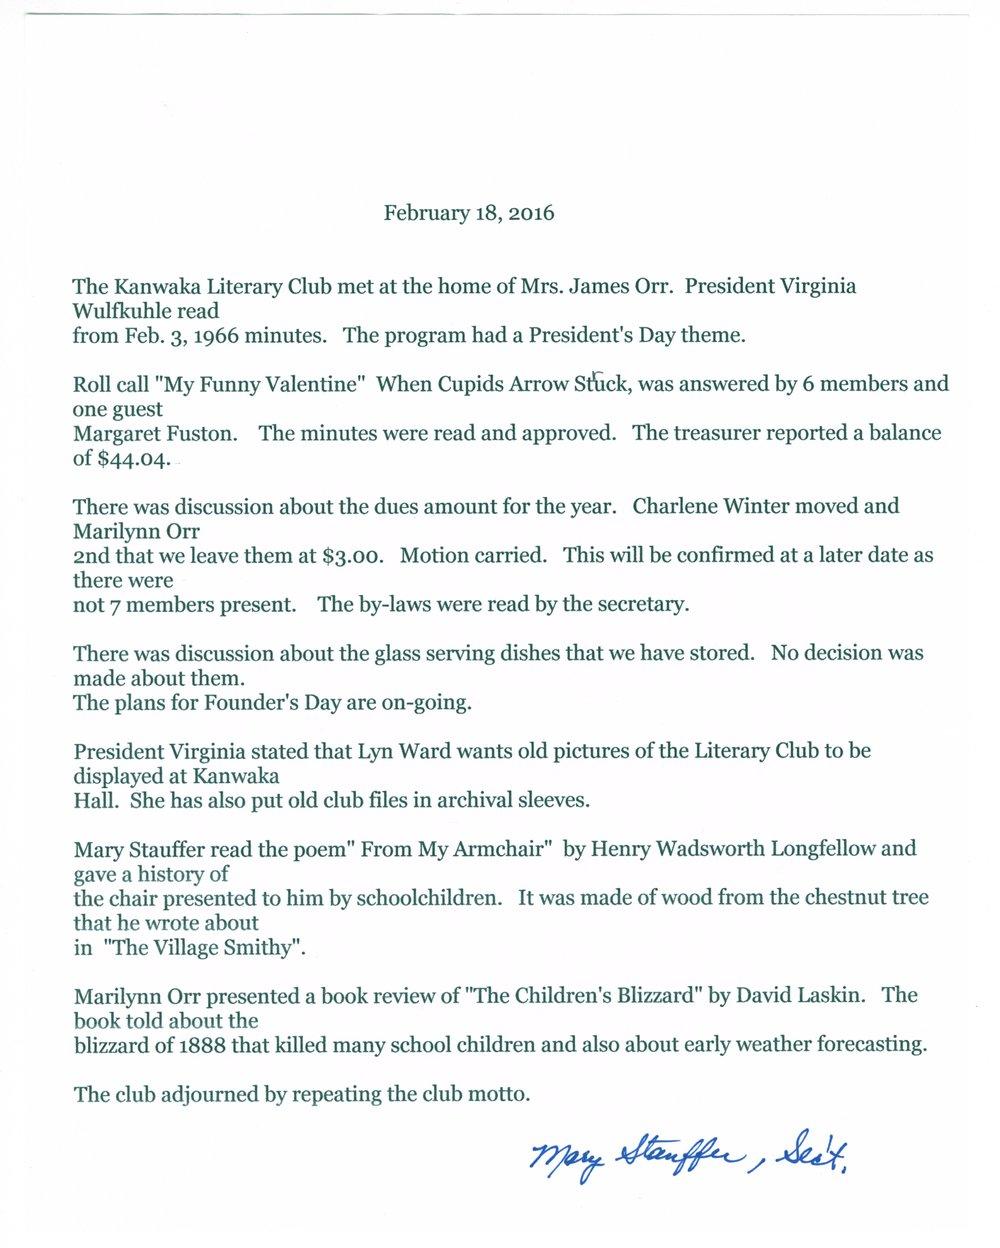 Kanwaka Literary Club records - February 18, 2016